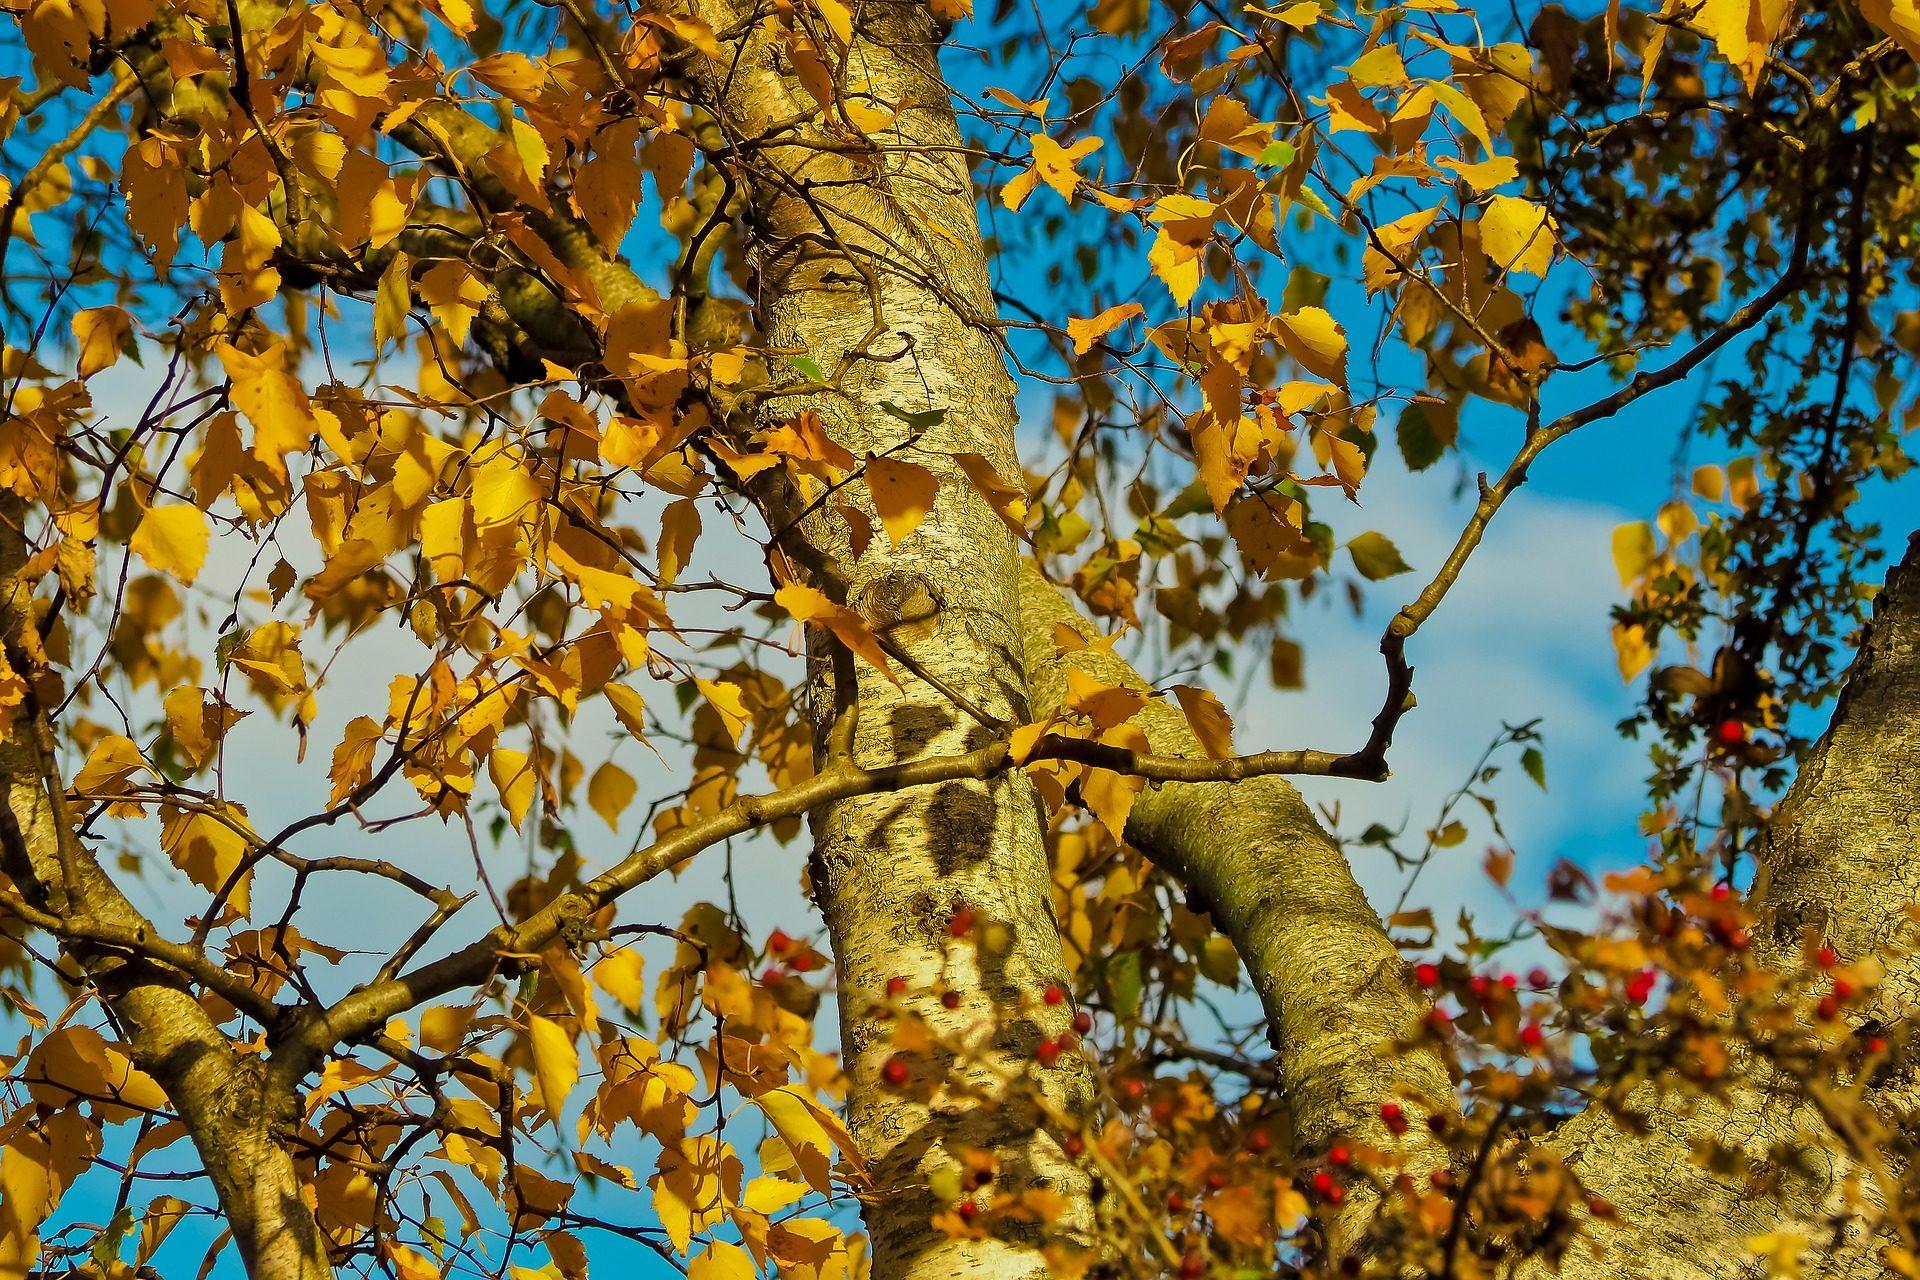 árbol, ramas, hojas, secas, otoño, caduco - Fondos de Pantalla HD - professor-falken.com